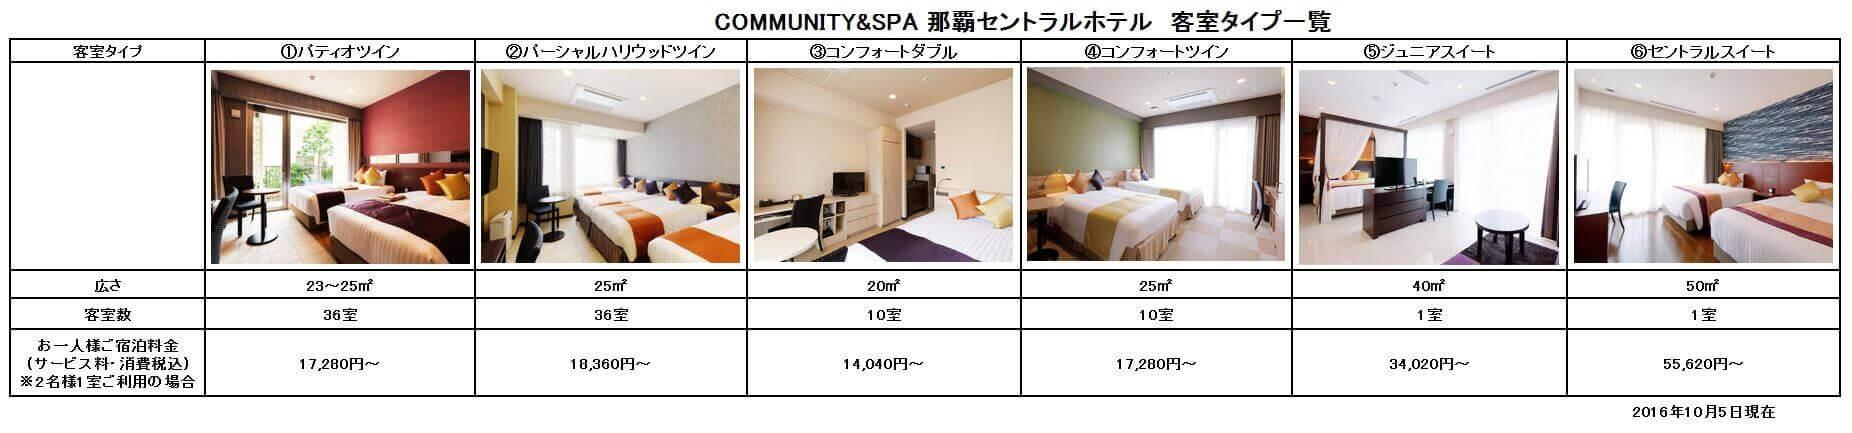 naha-central-hotel-chart